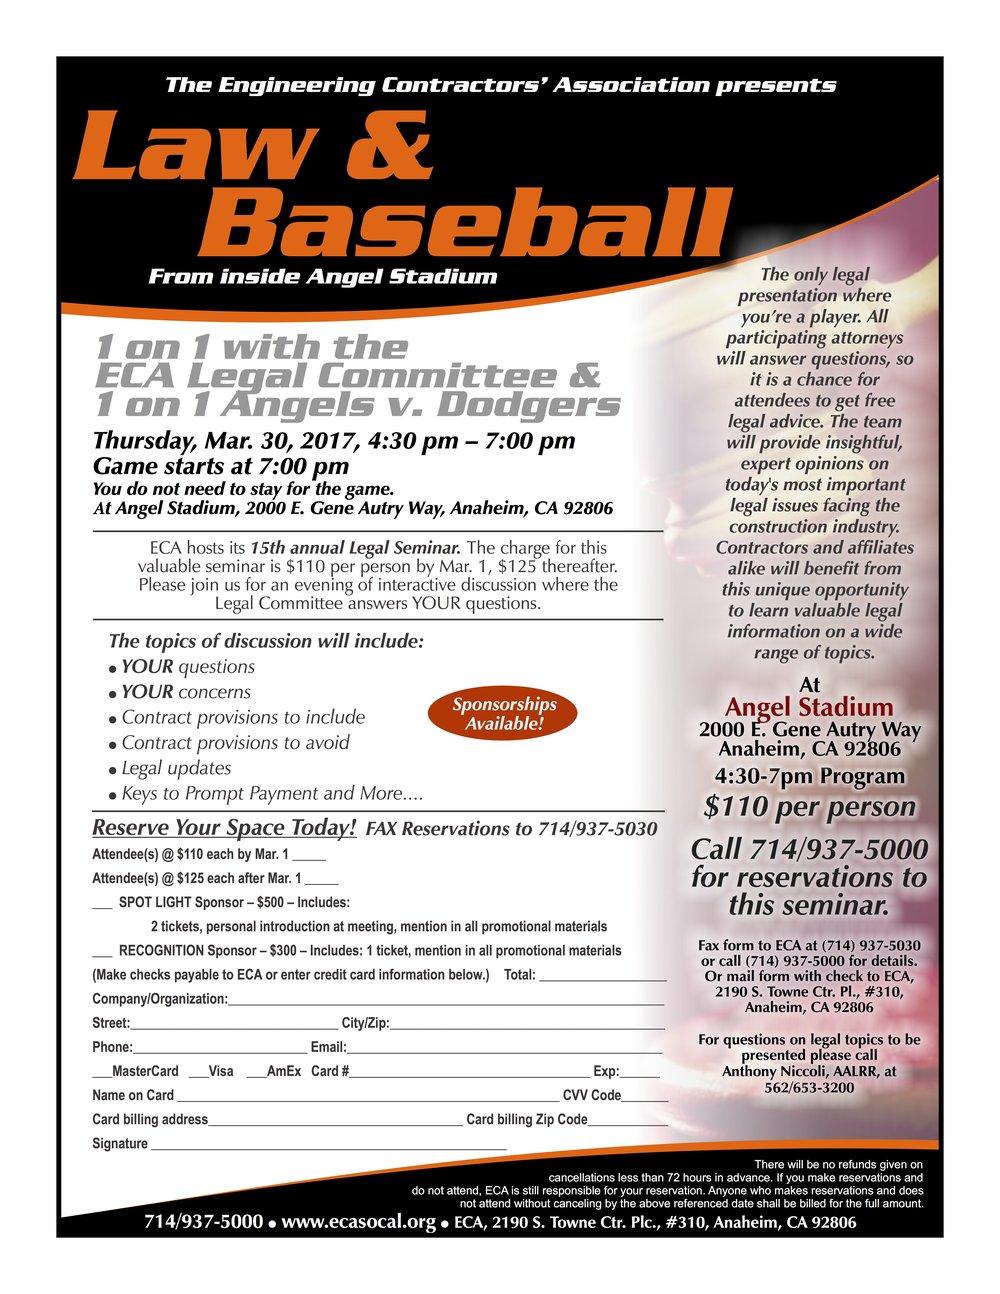 Law & Baseball